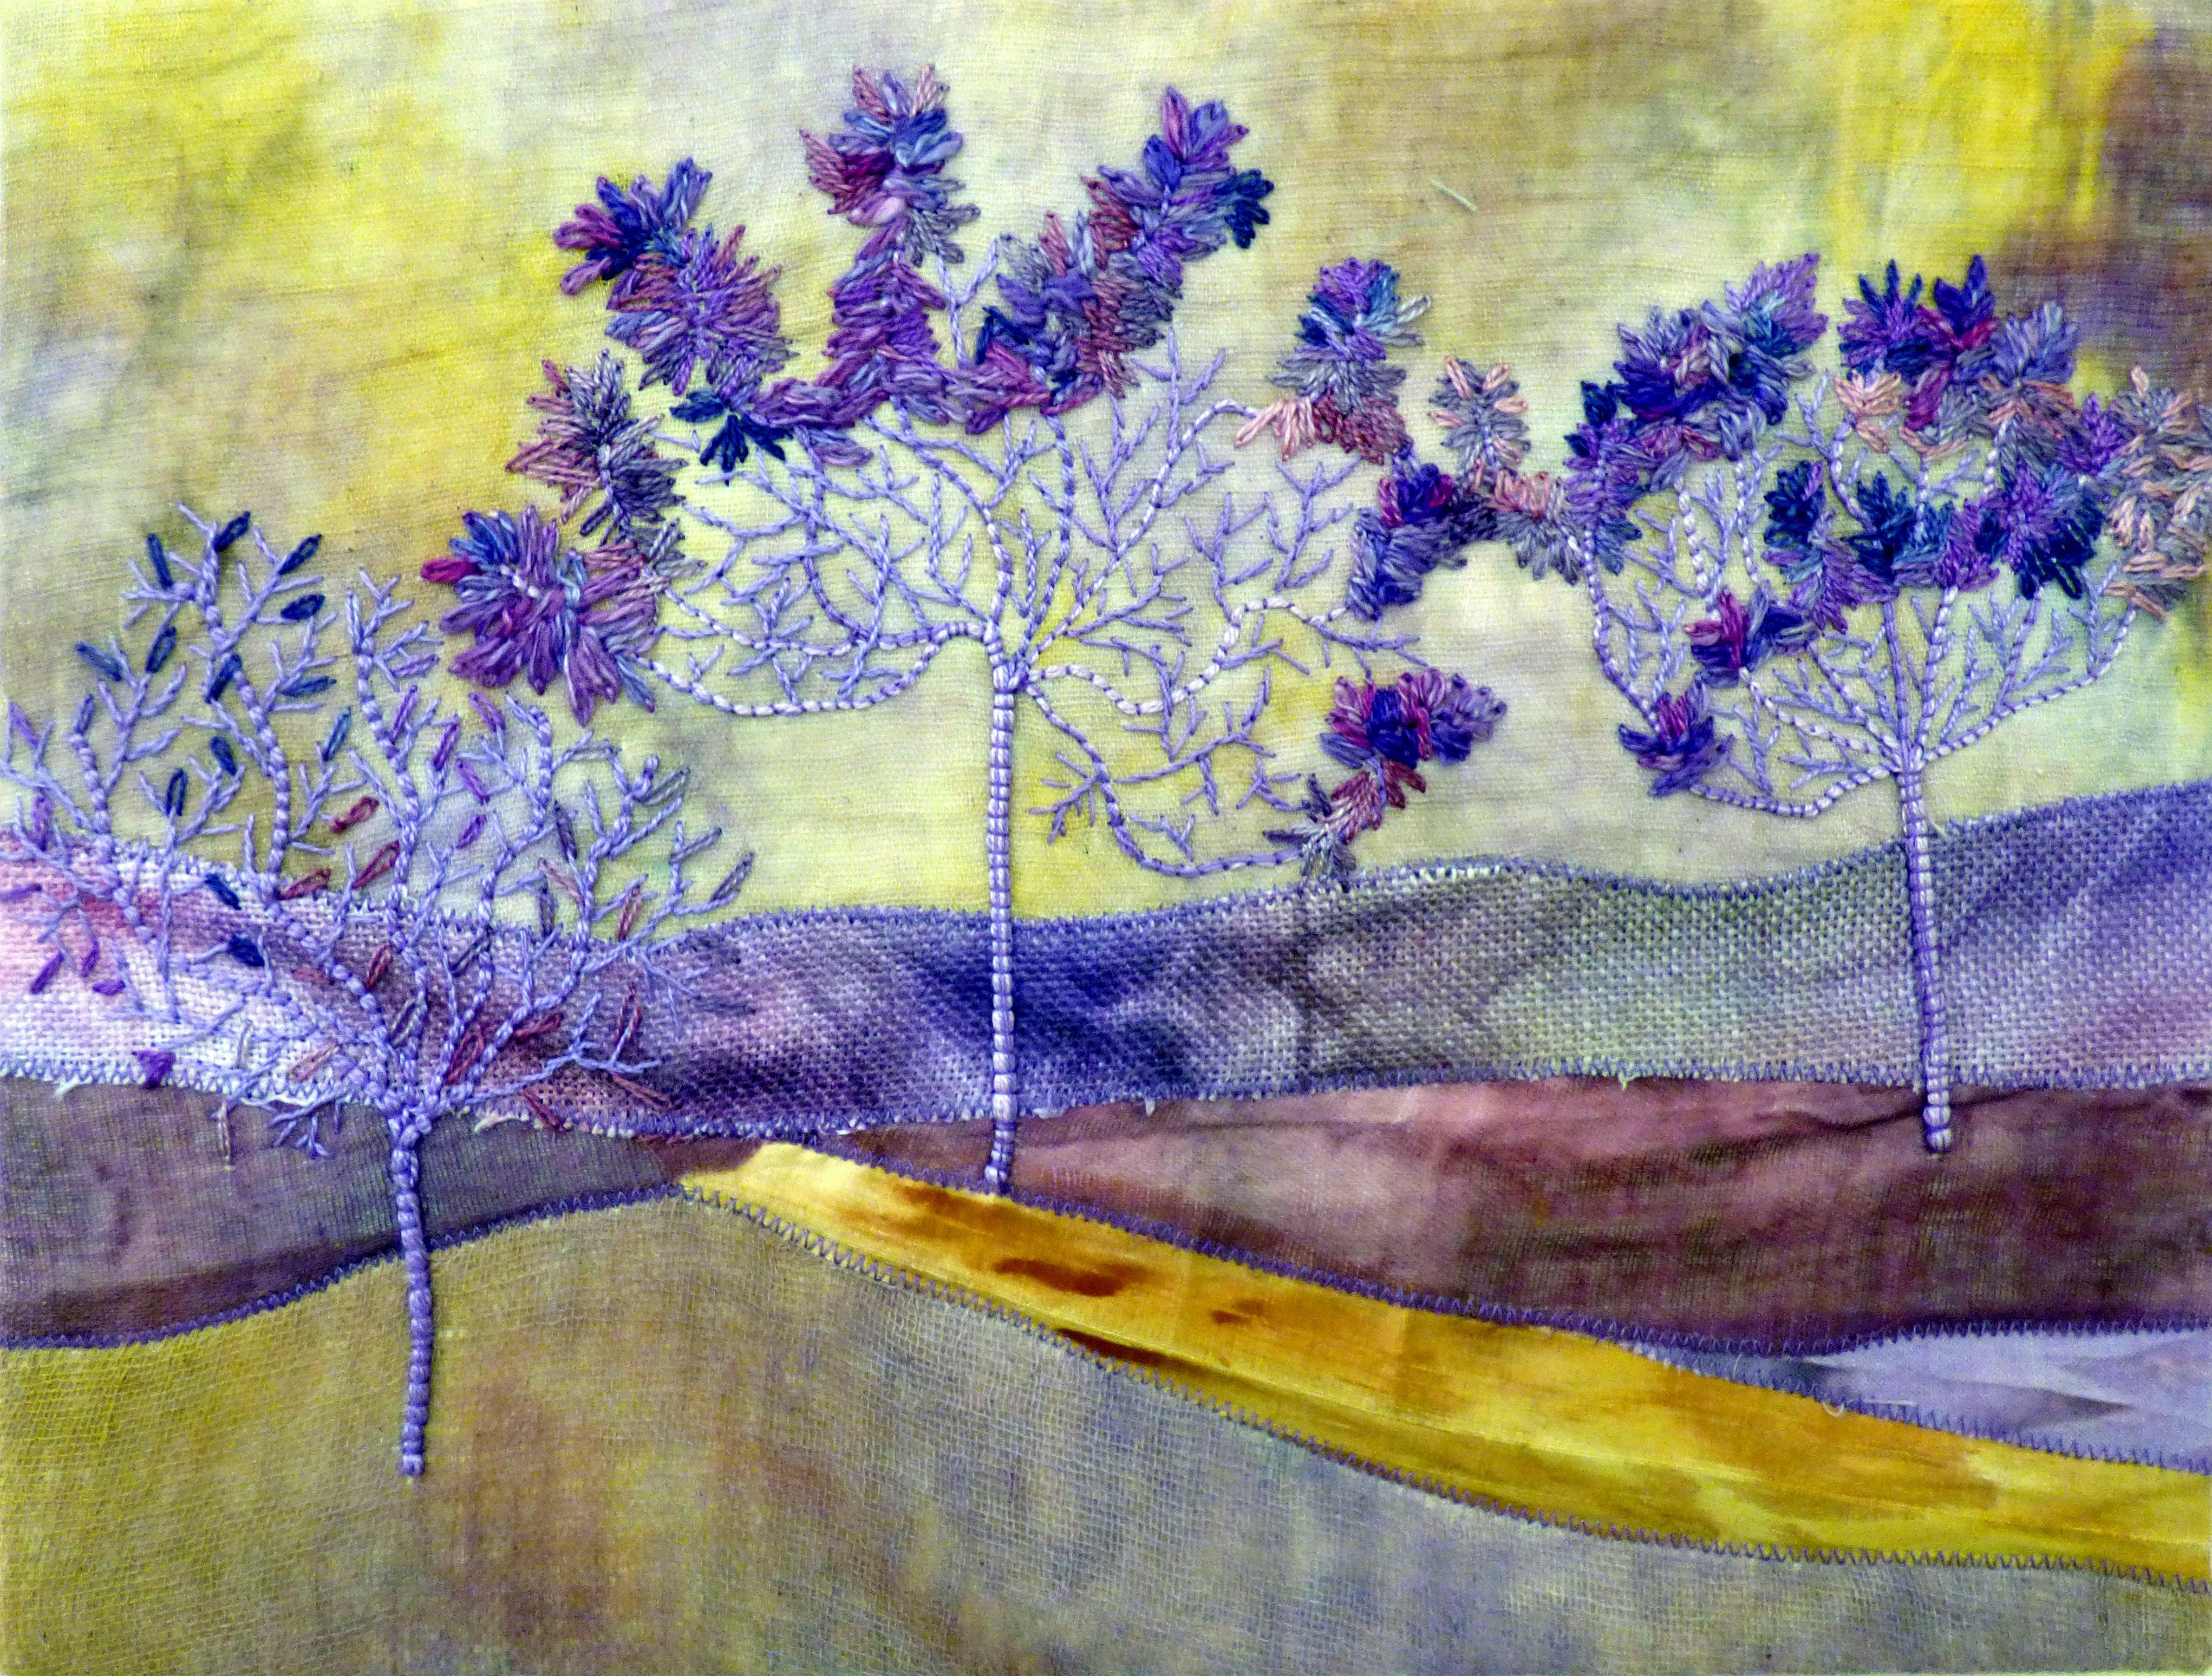 PURPLE DUSK by Christine Bardsley, Glossop & District EG, hand dyed fabric, machine stitching and hand stitching